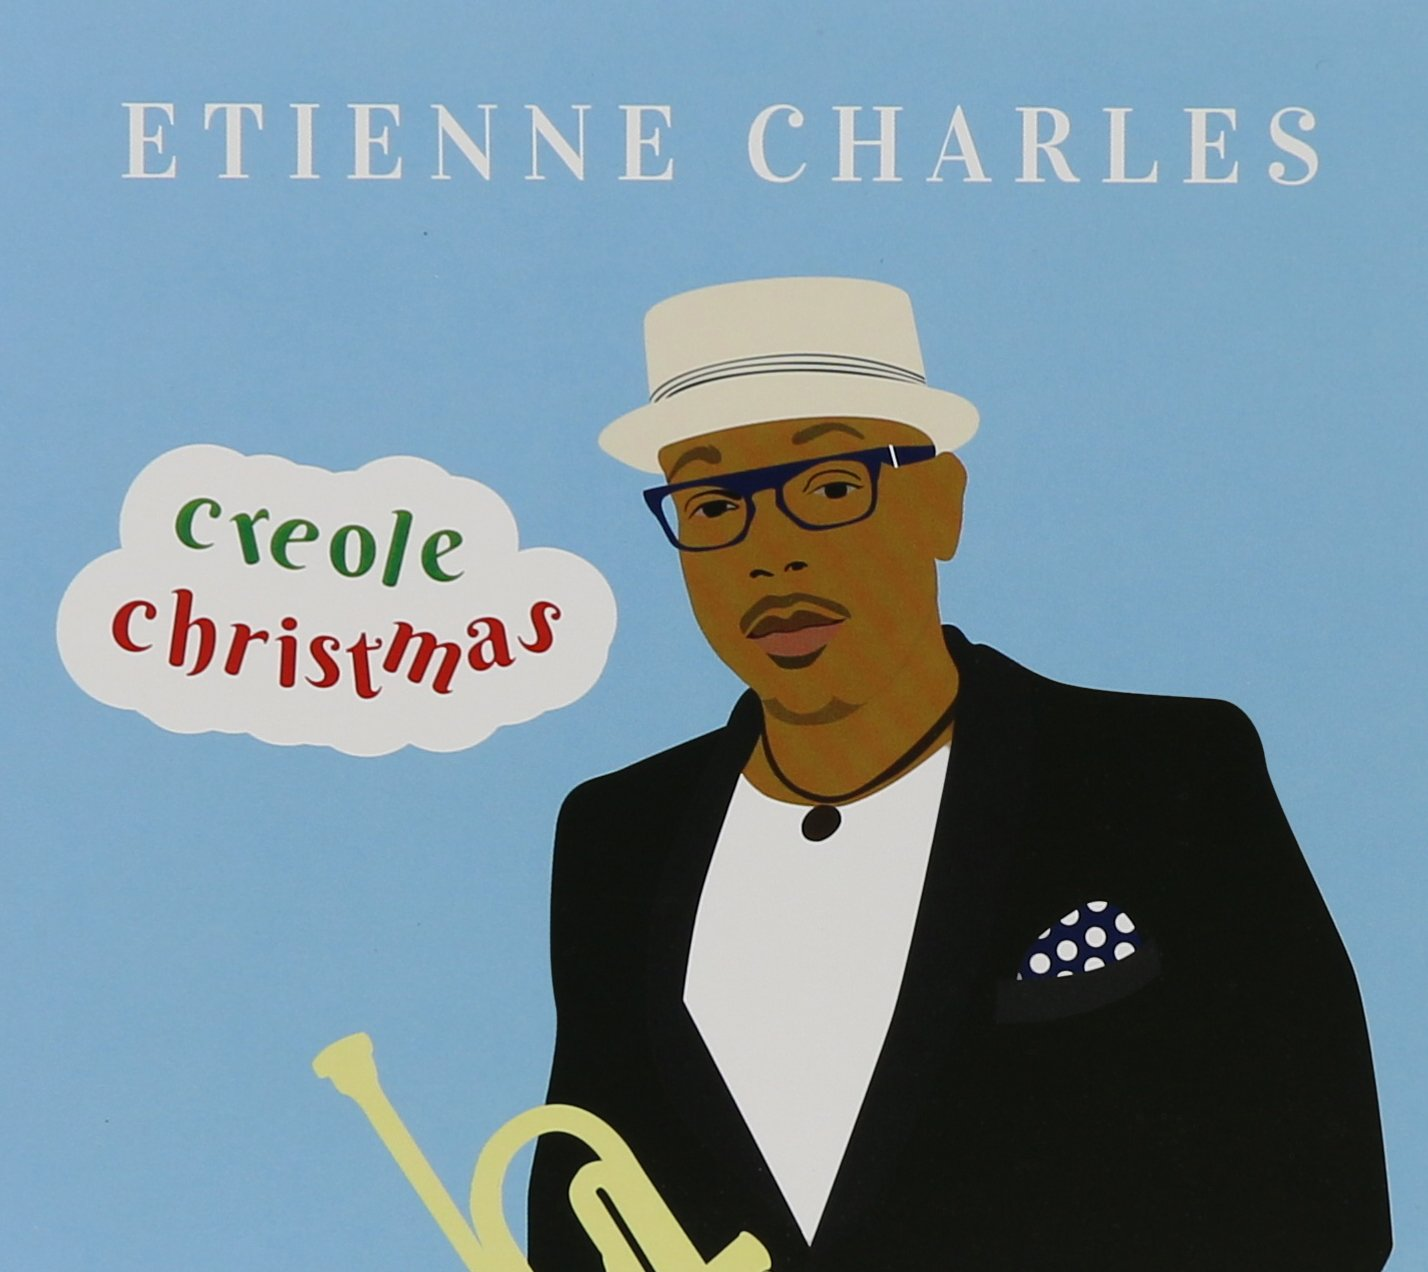 Etienne Charles - Creole Christmas - Amazon.com Music